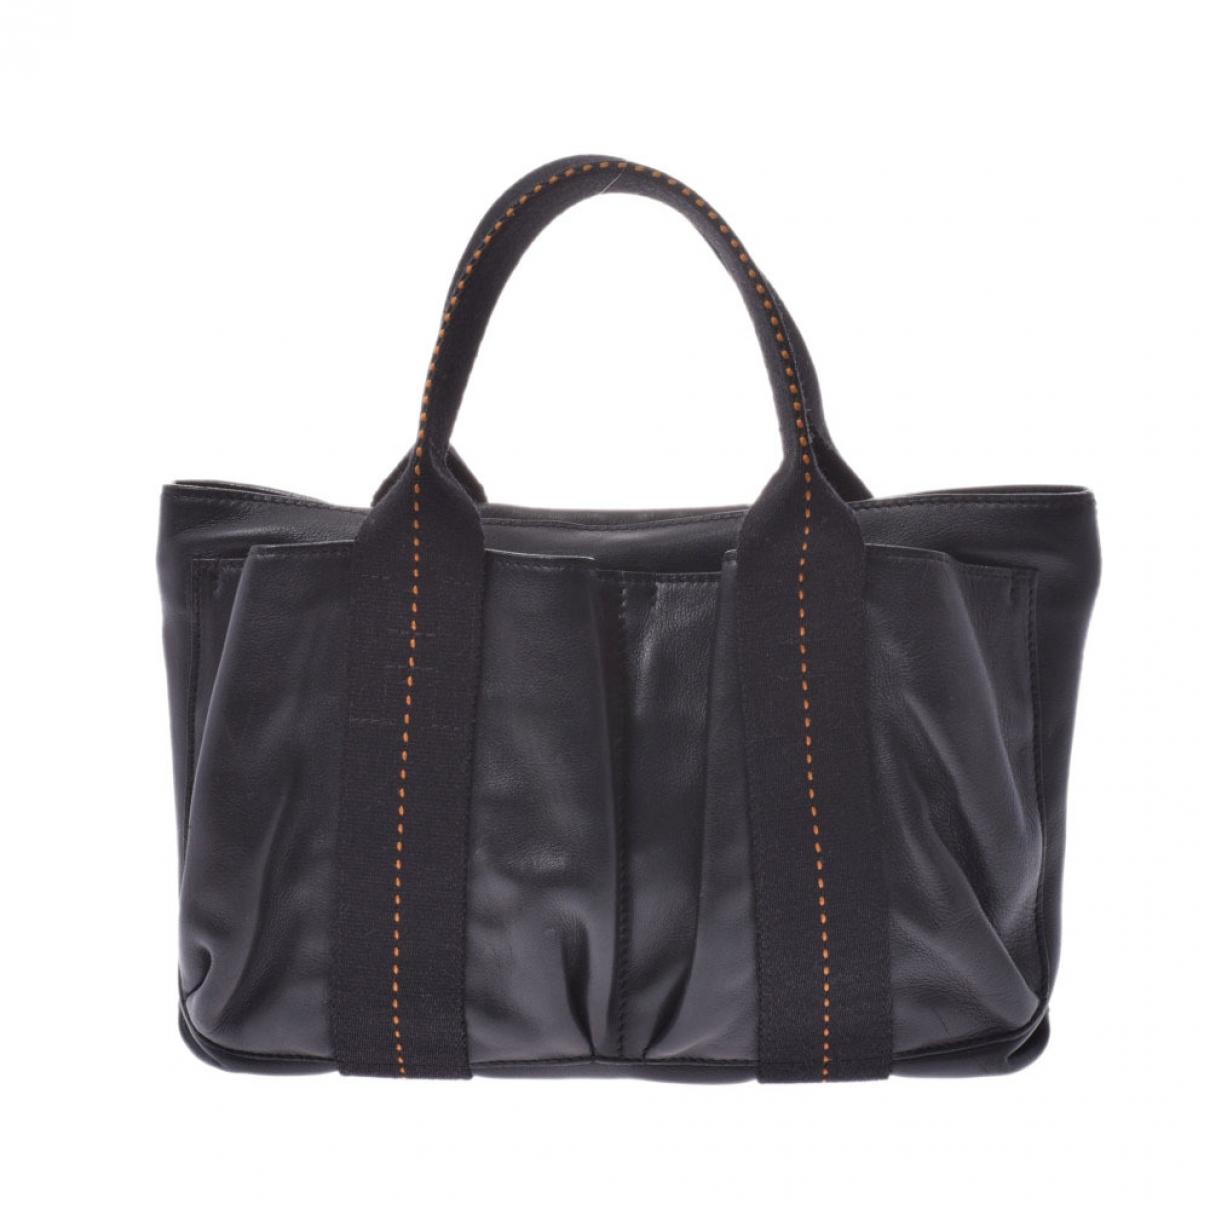 Hermès Caravane Black Leather handbag for Women \N